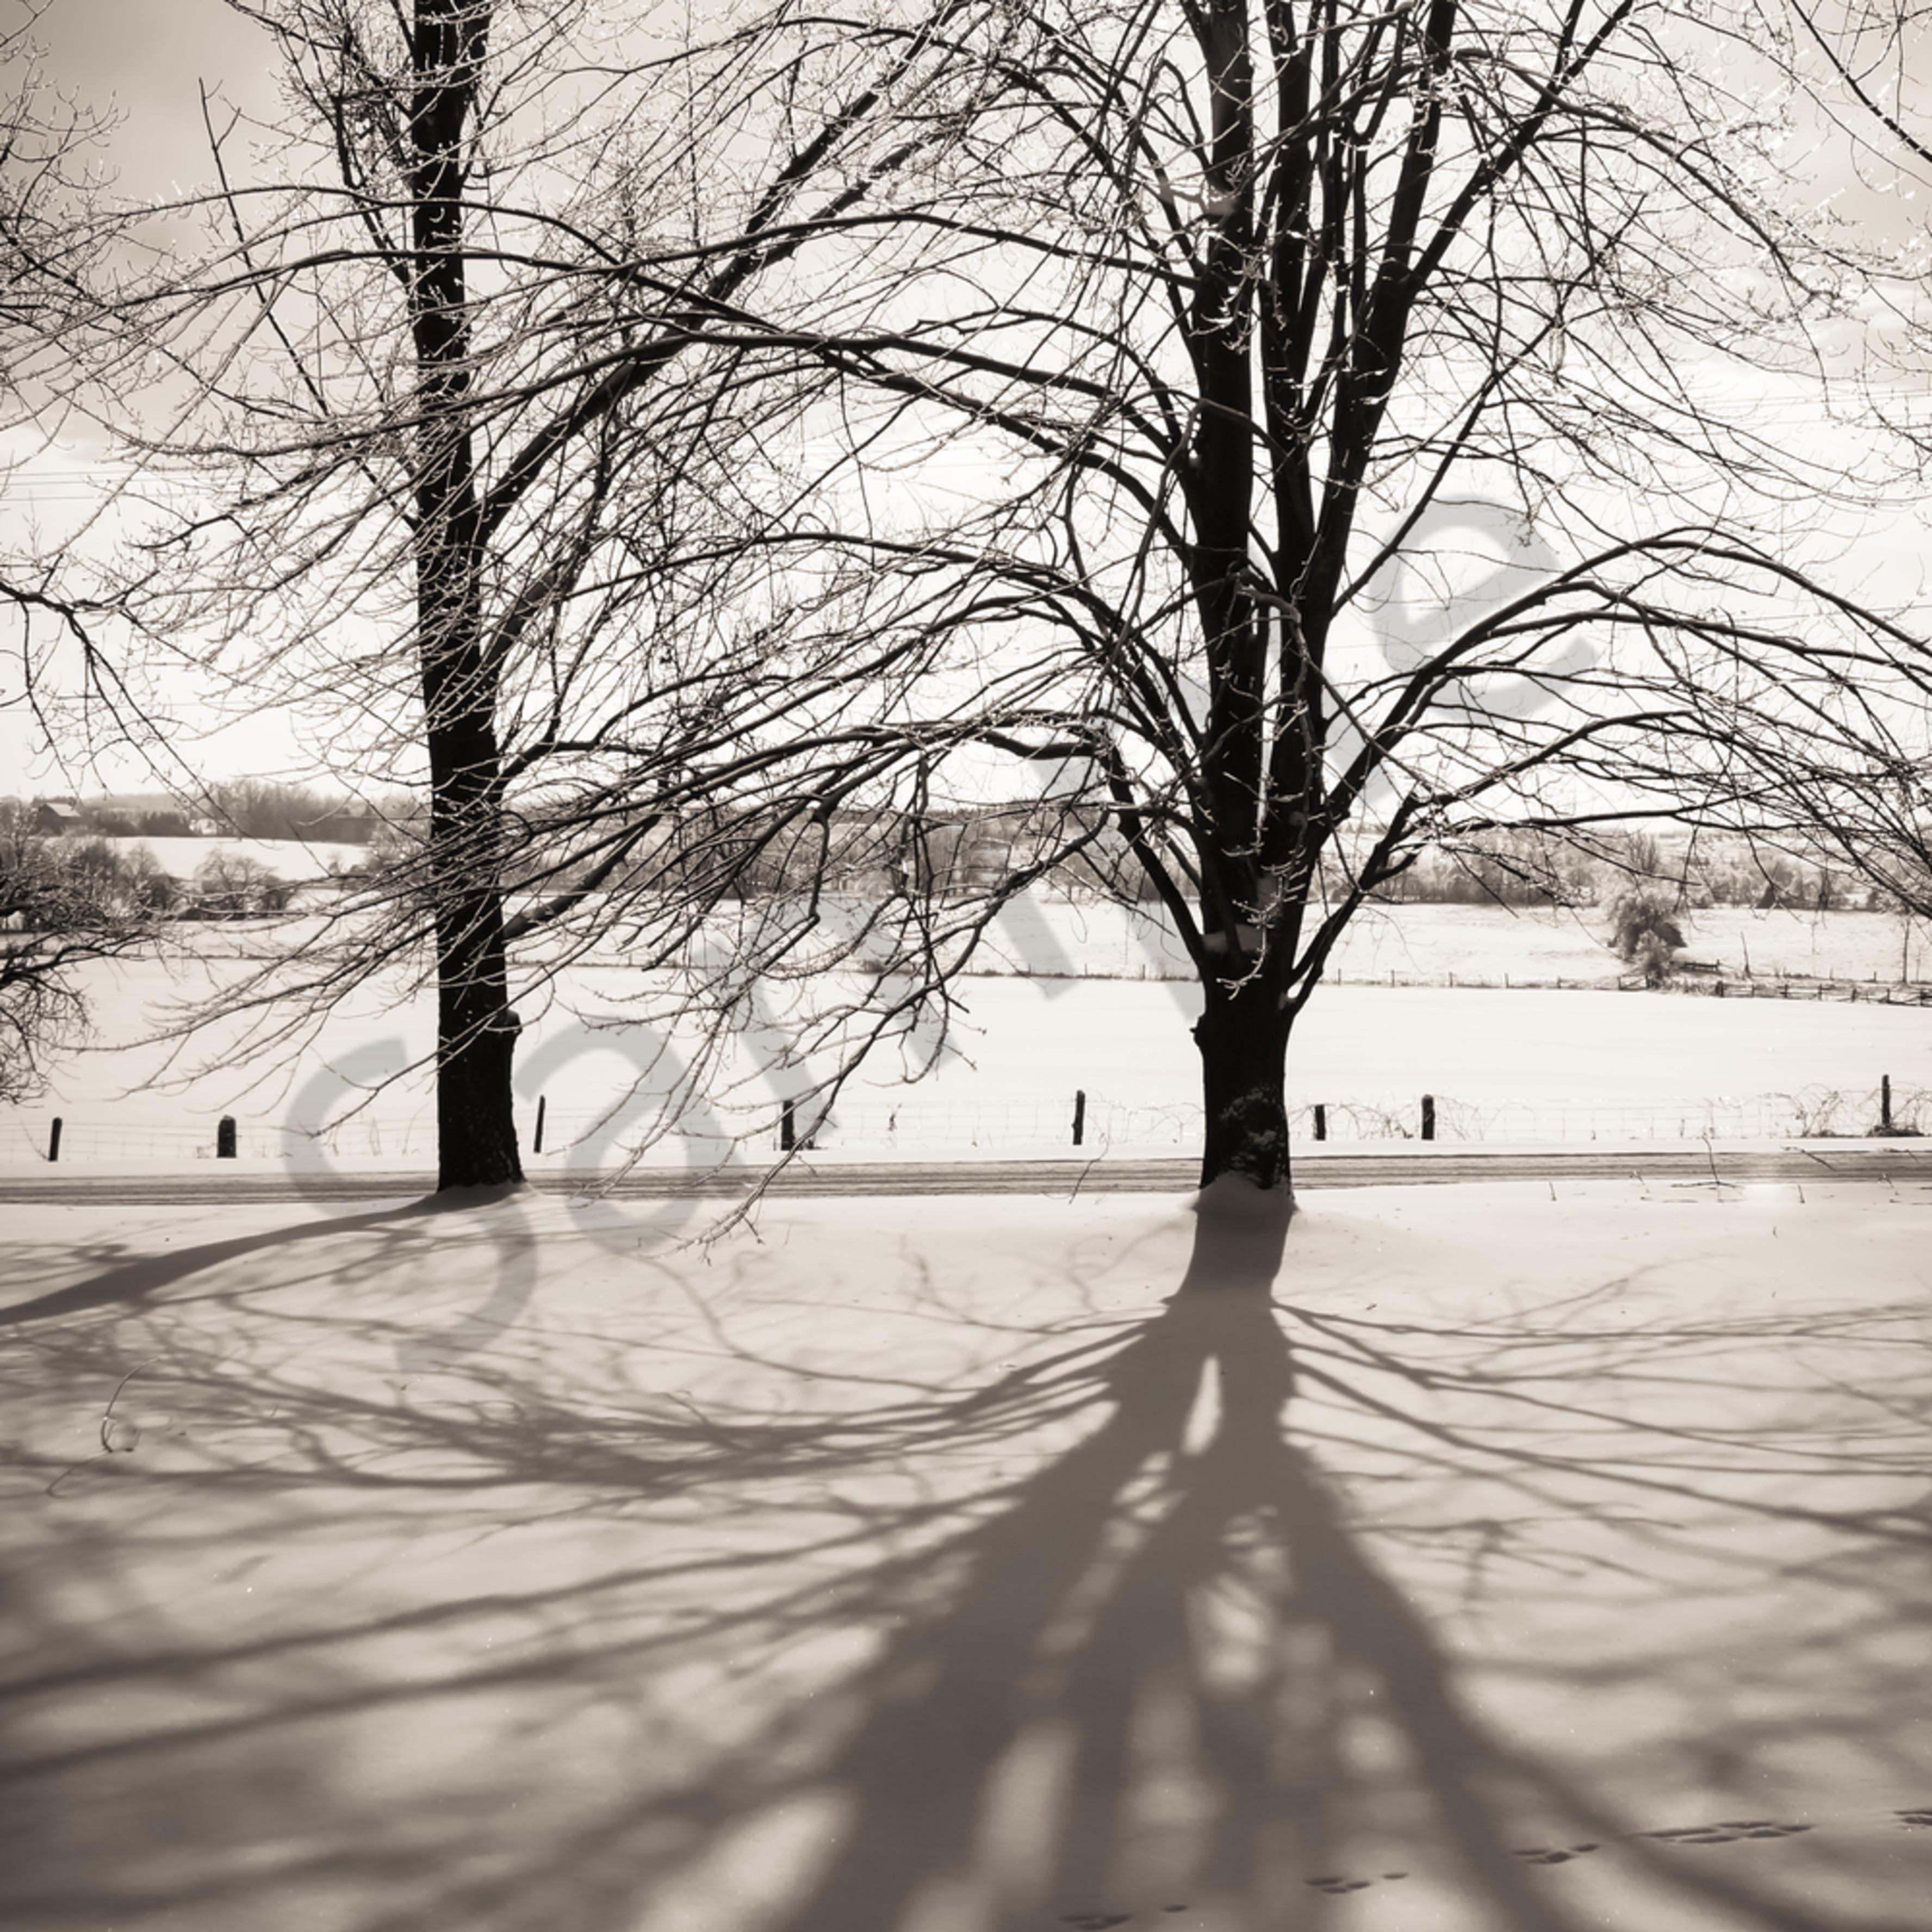 Winter maple cnjcsv